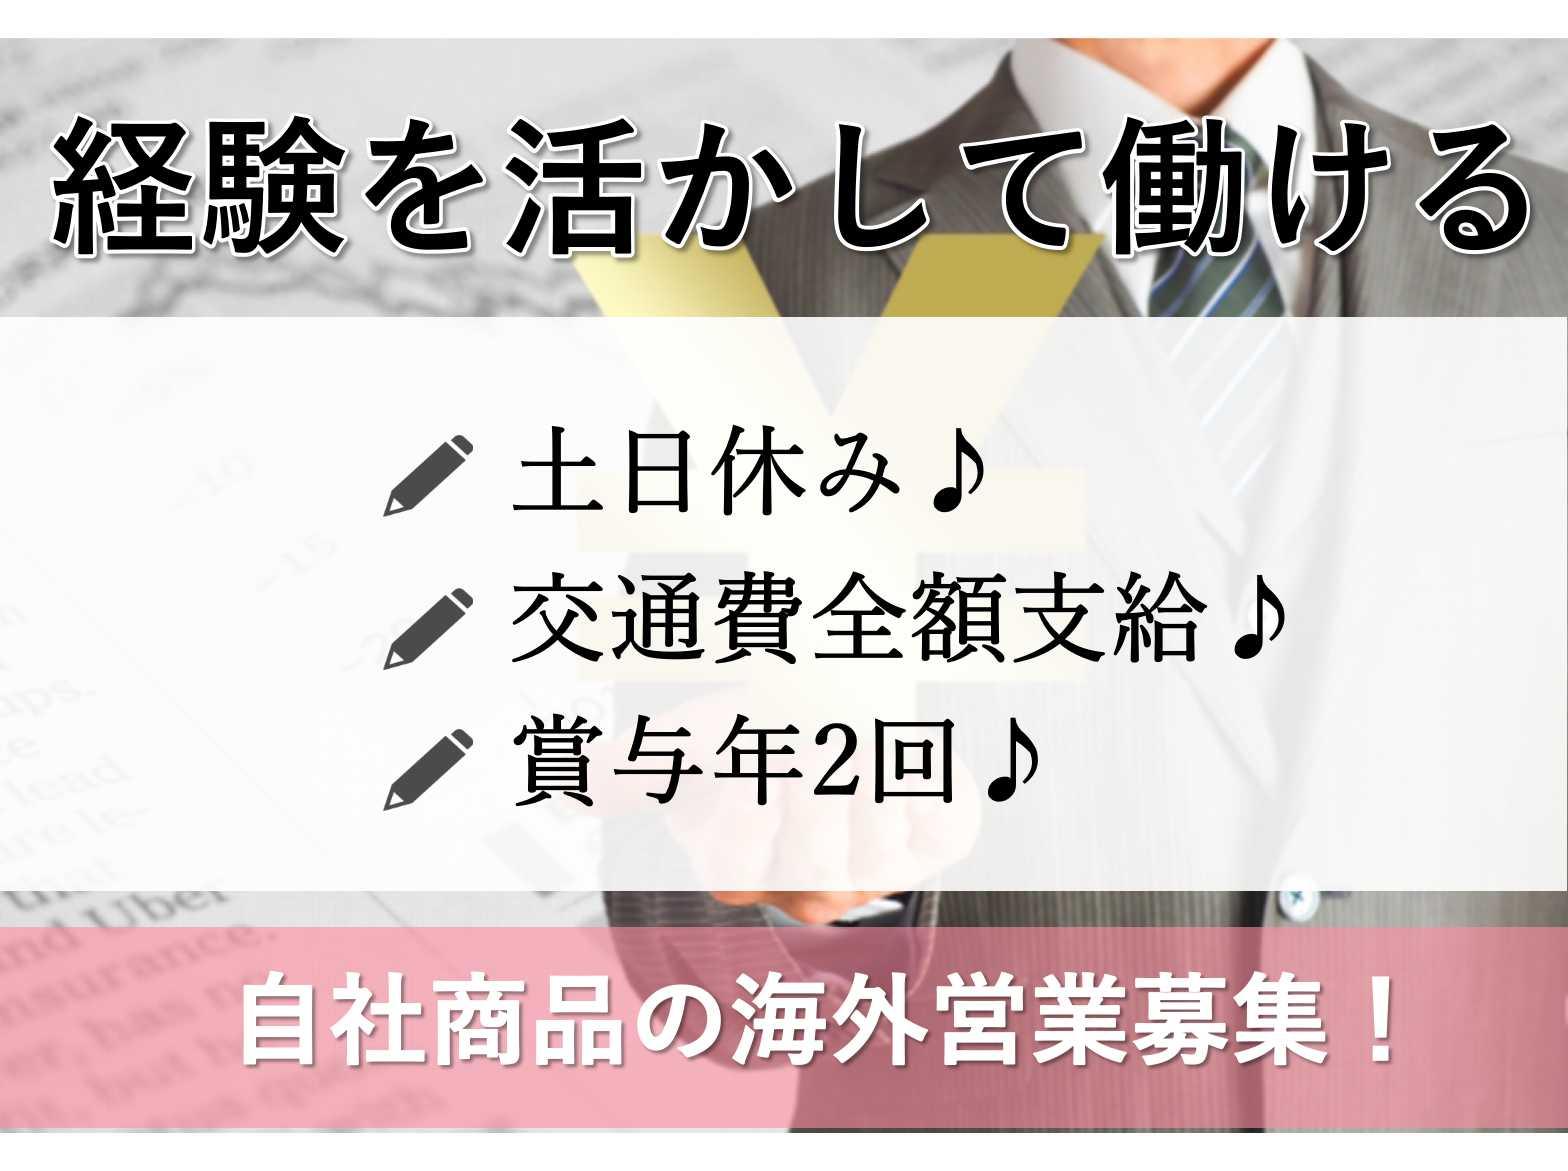 【正社員】土日休み♪年間休日110日以上♪海外営業募集! イメージ